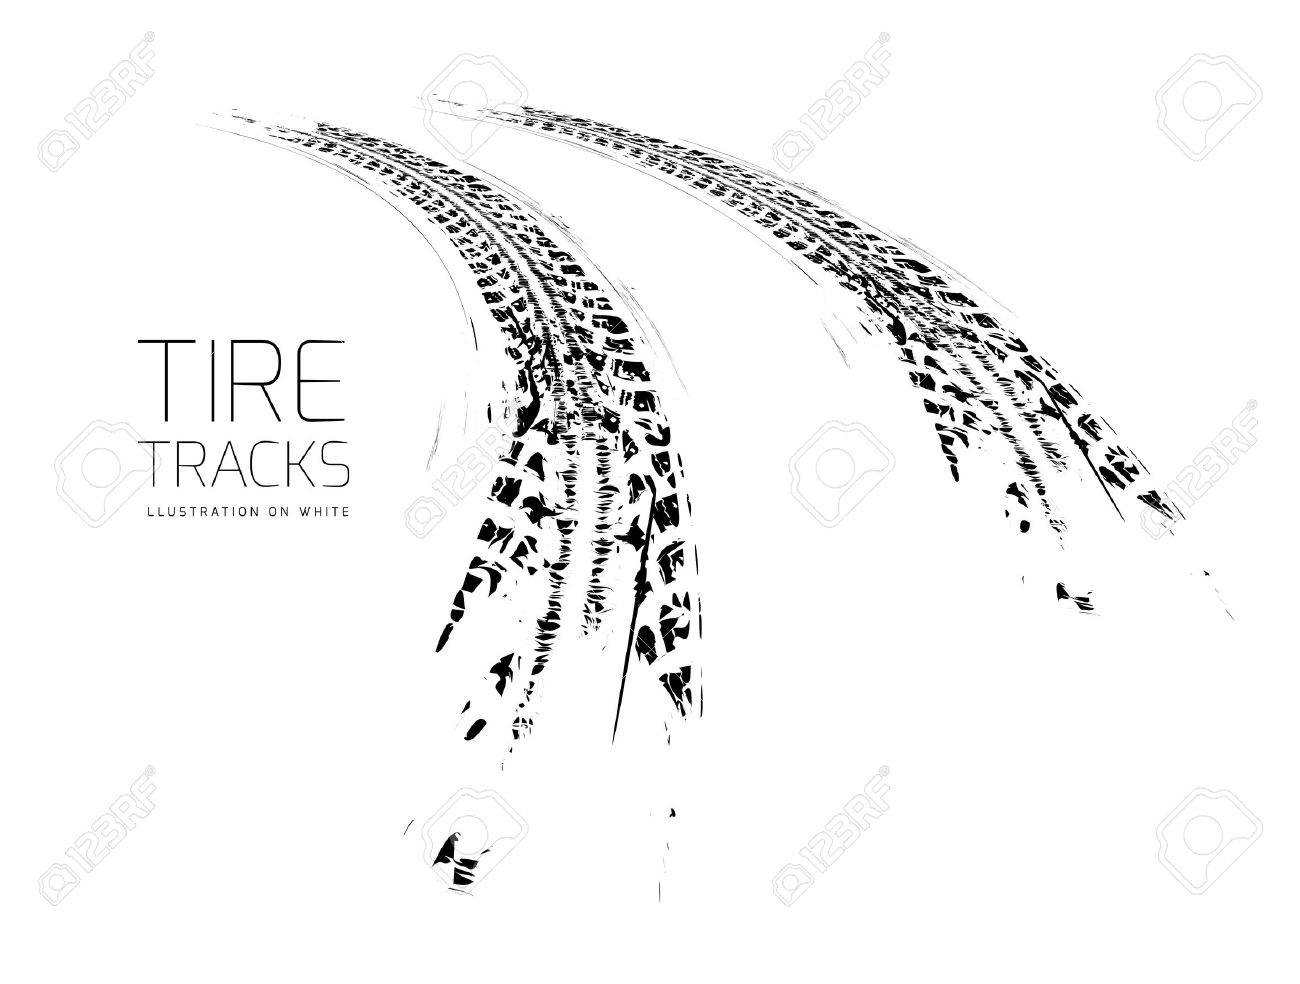 Tire tracks background - 38663685